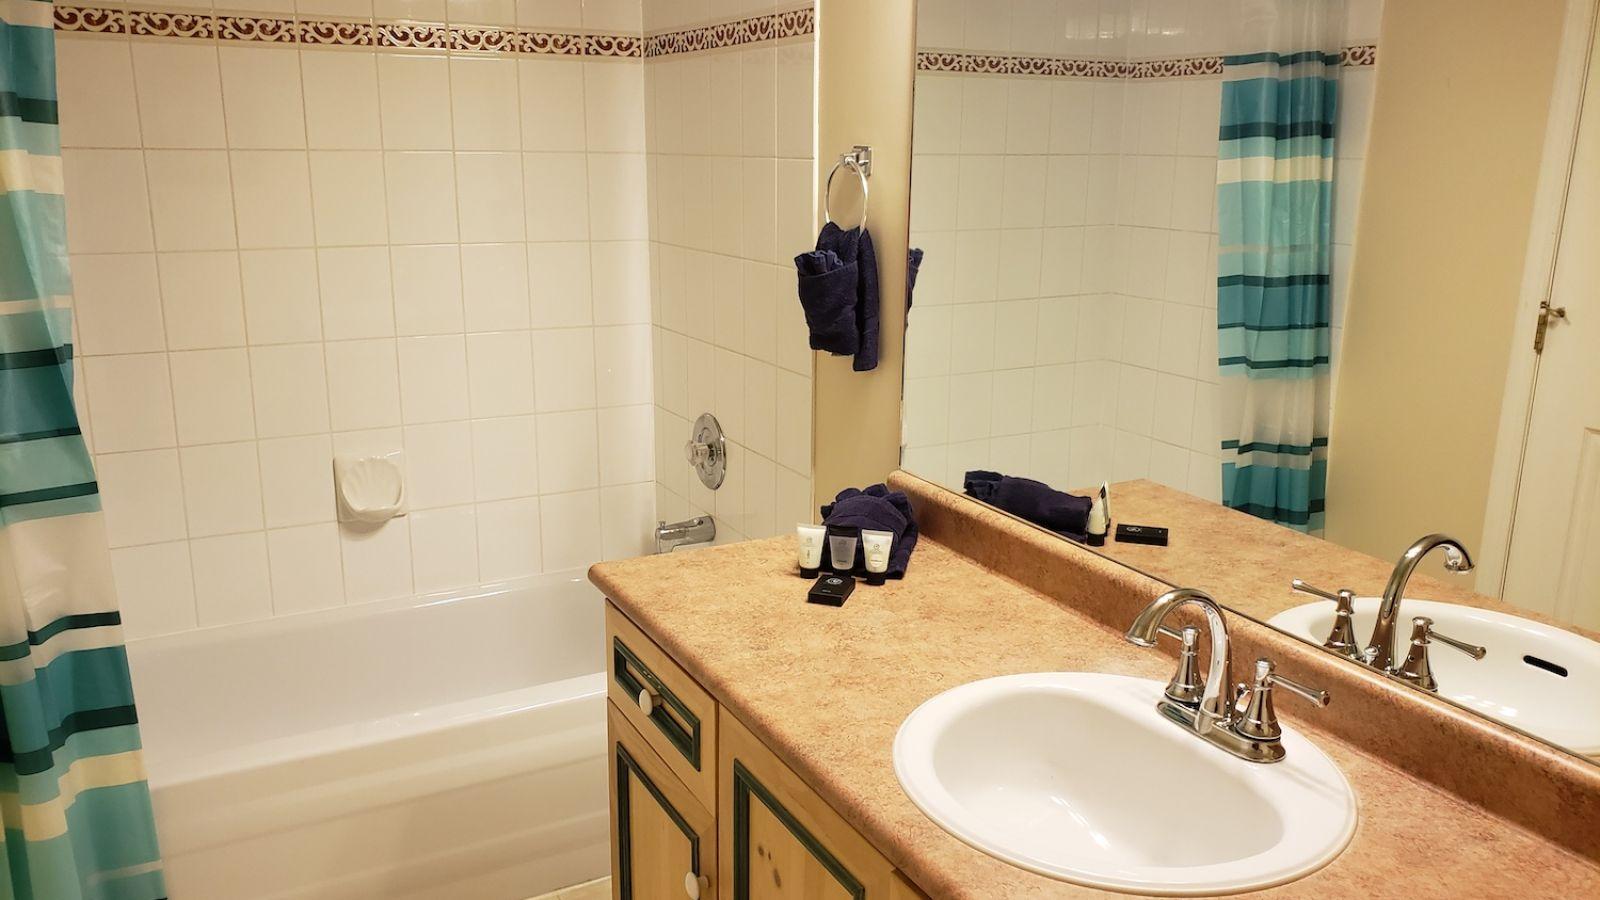 Borgata Lodge - typical bathroom